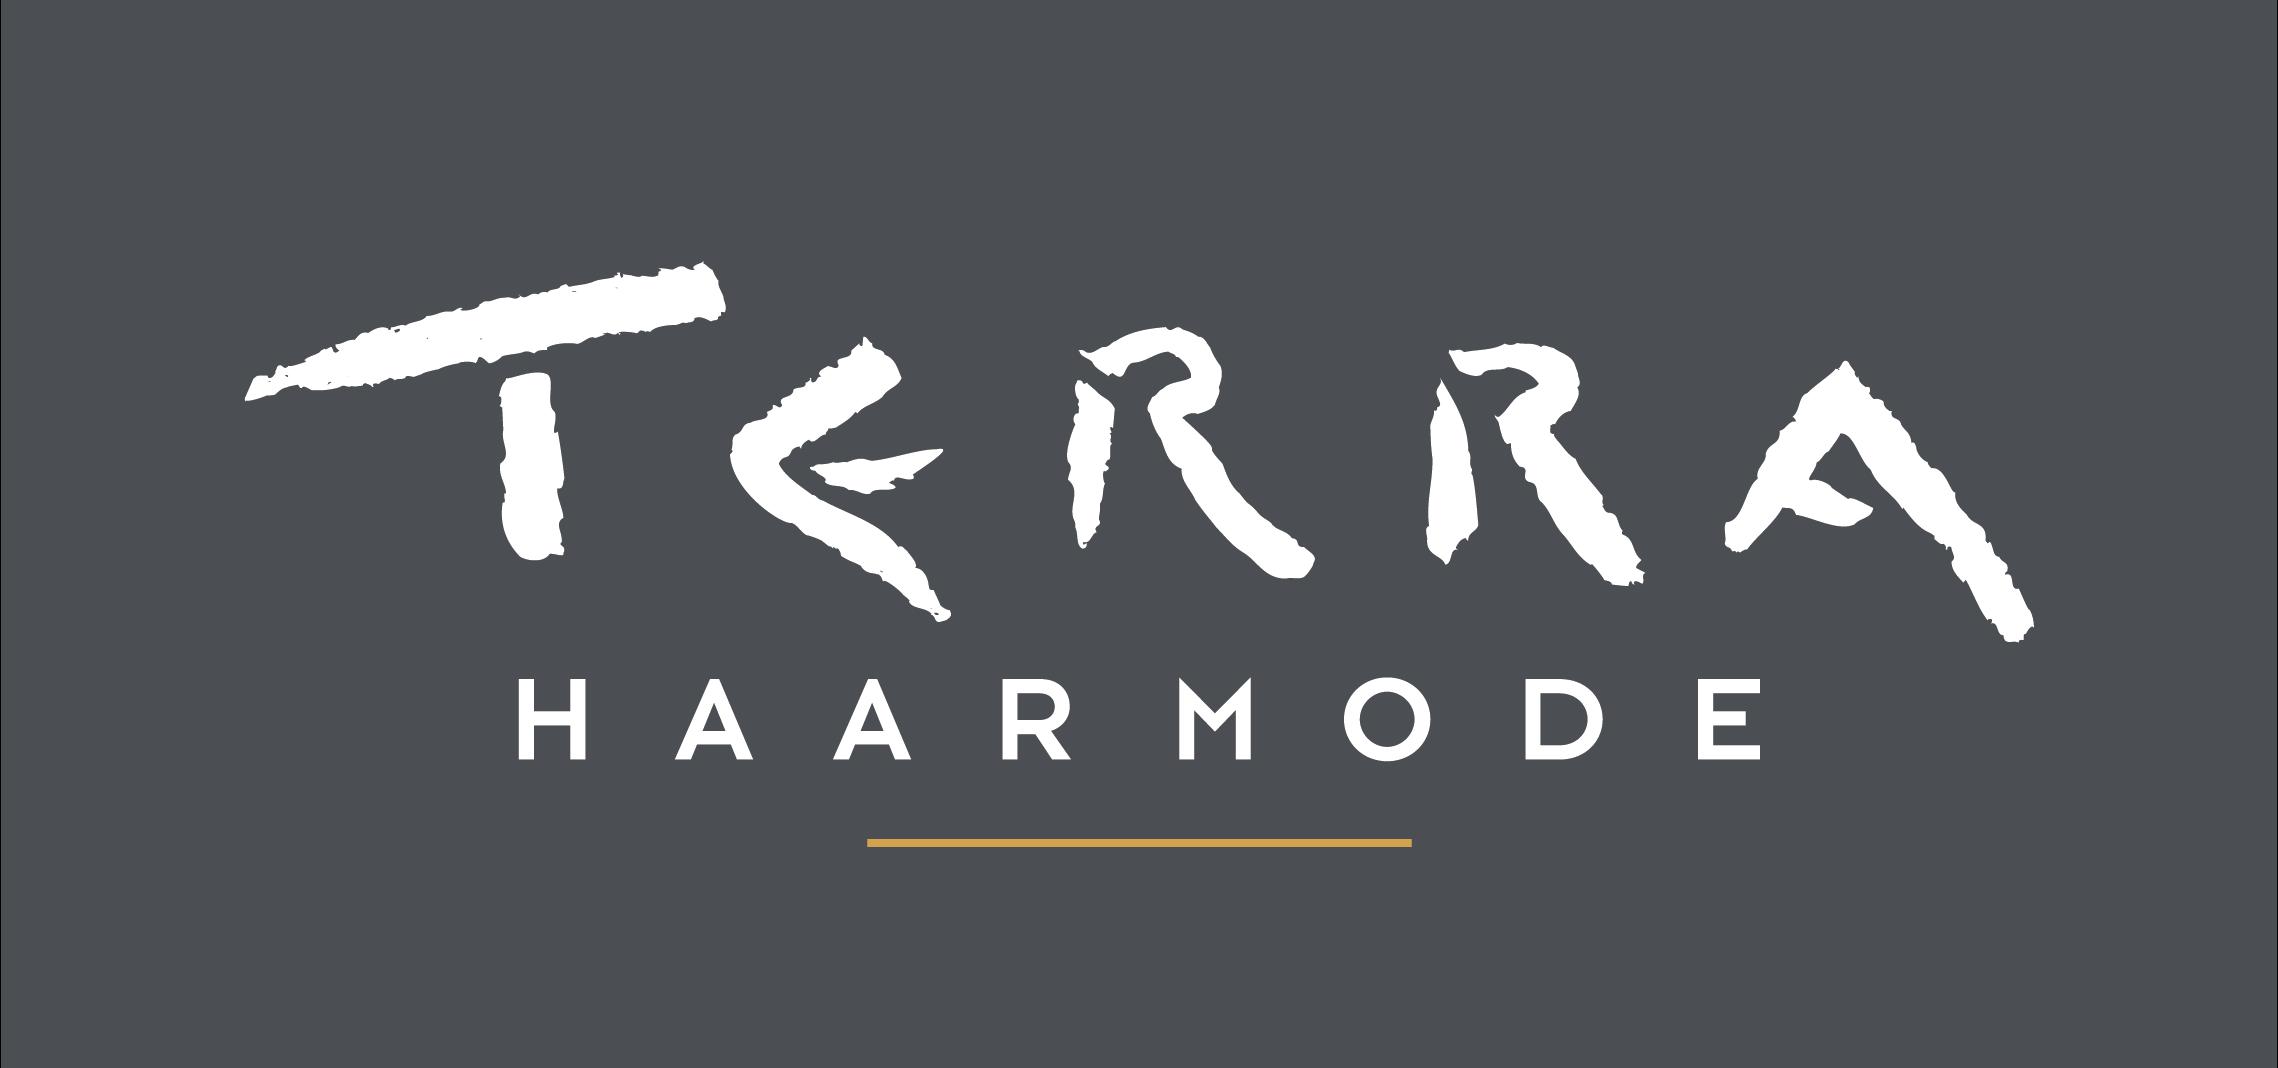 Logo_Terra_Haarmode